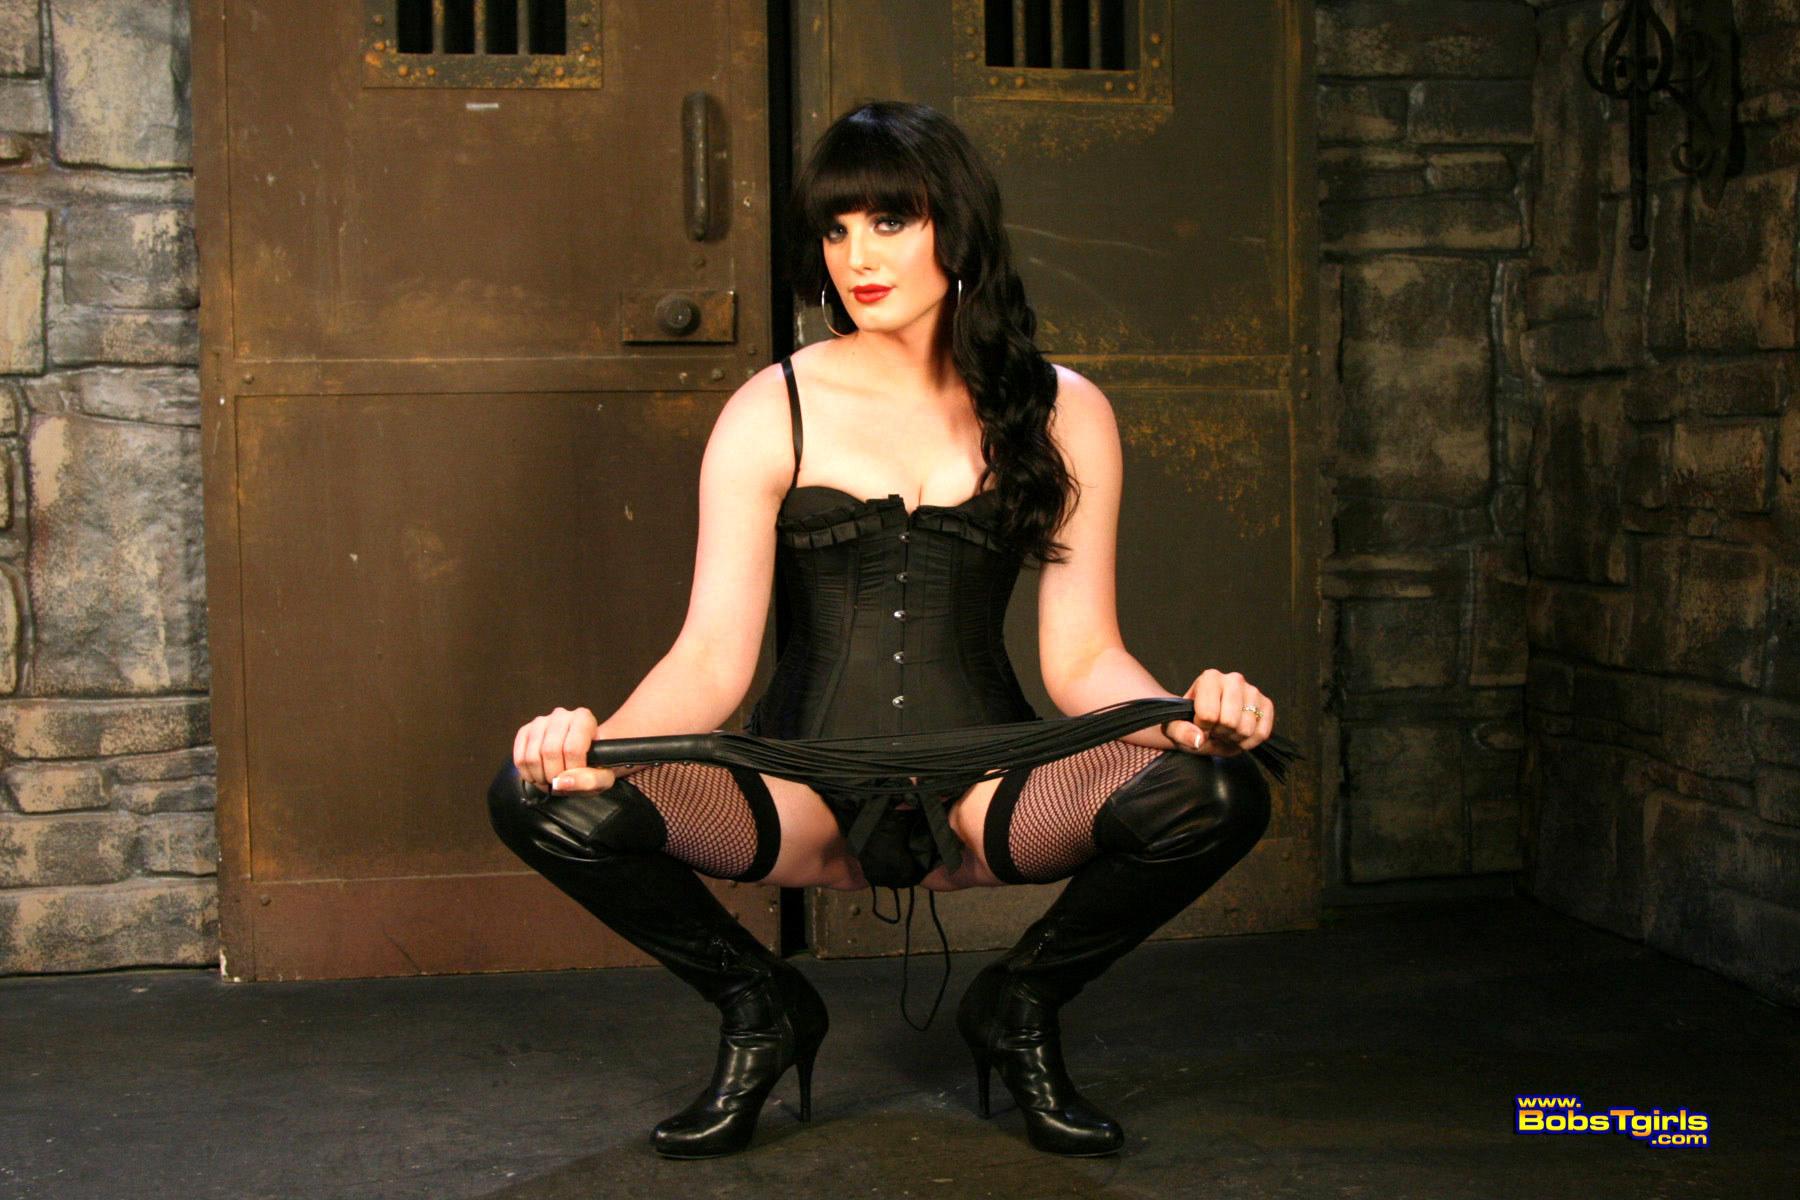 Caged T-Girl Destiny Hart Posing Her Fantastic Body